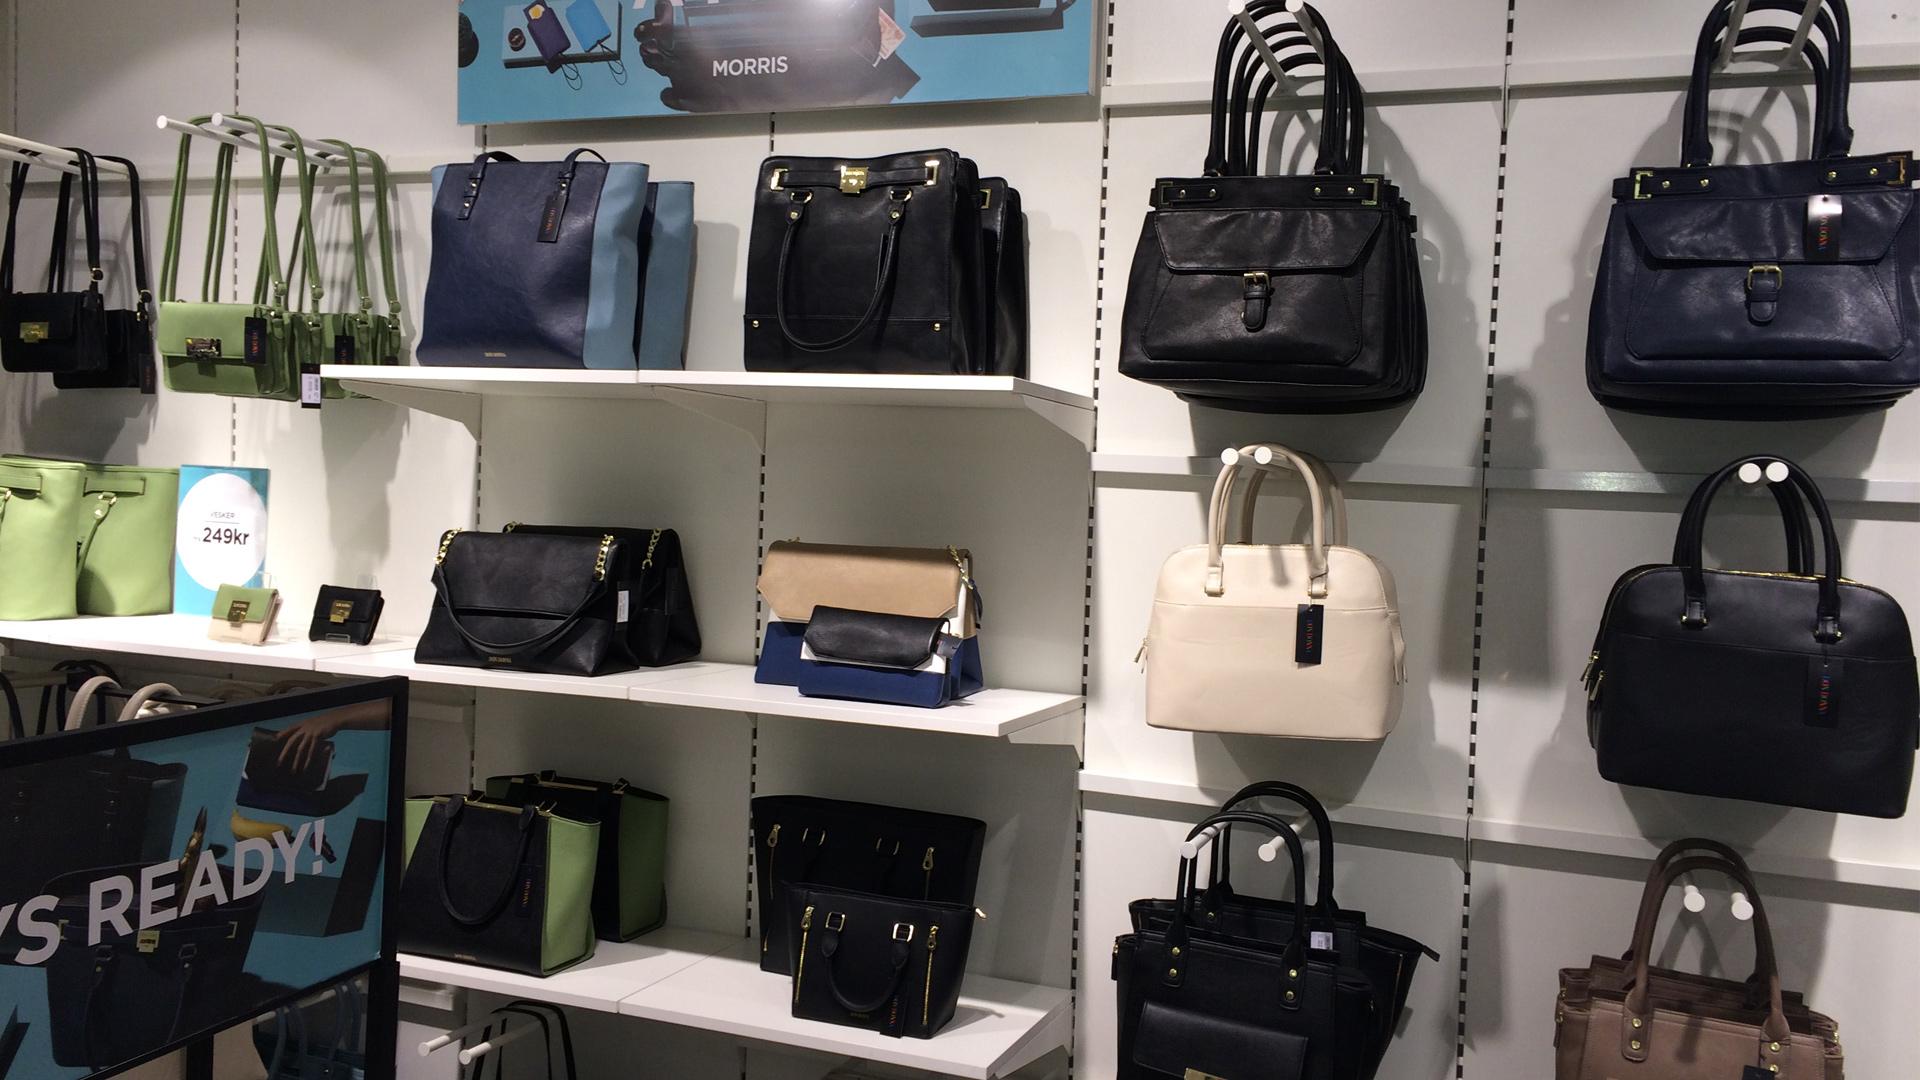 Referens Venue Retail Group Morris